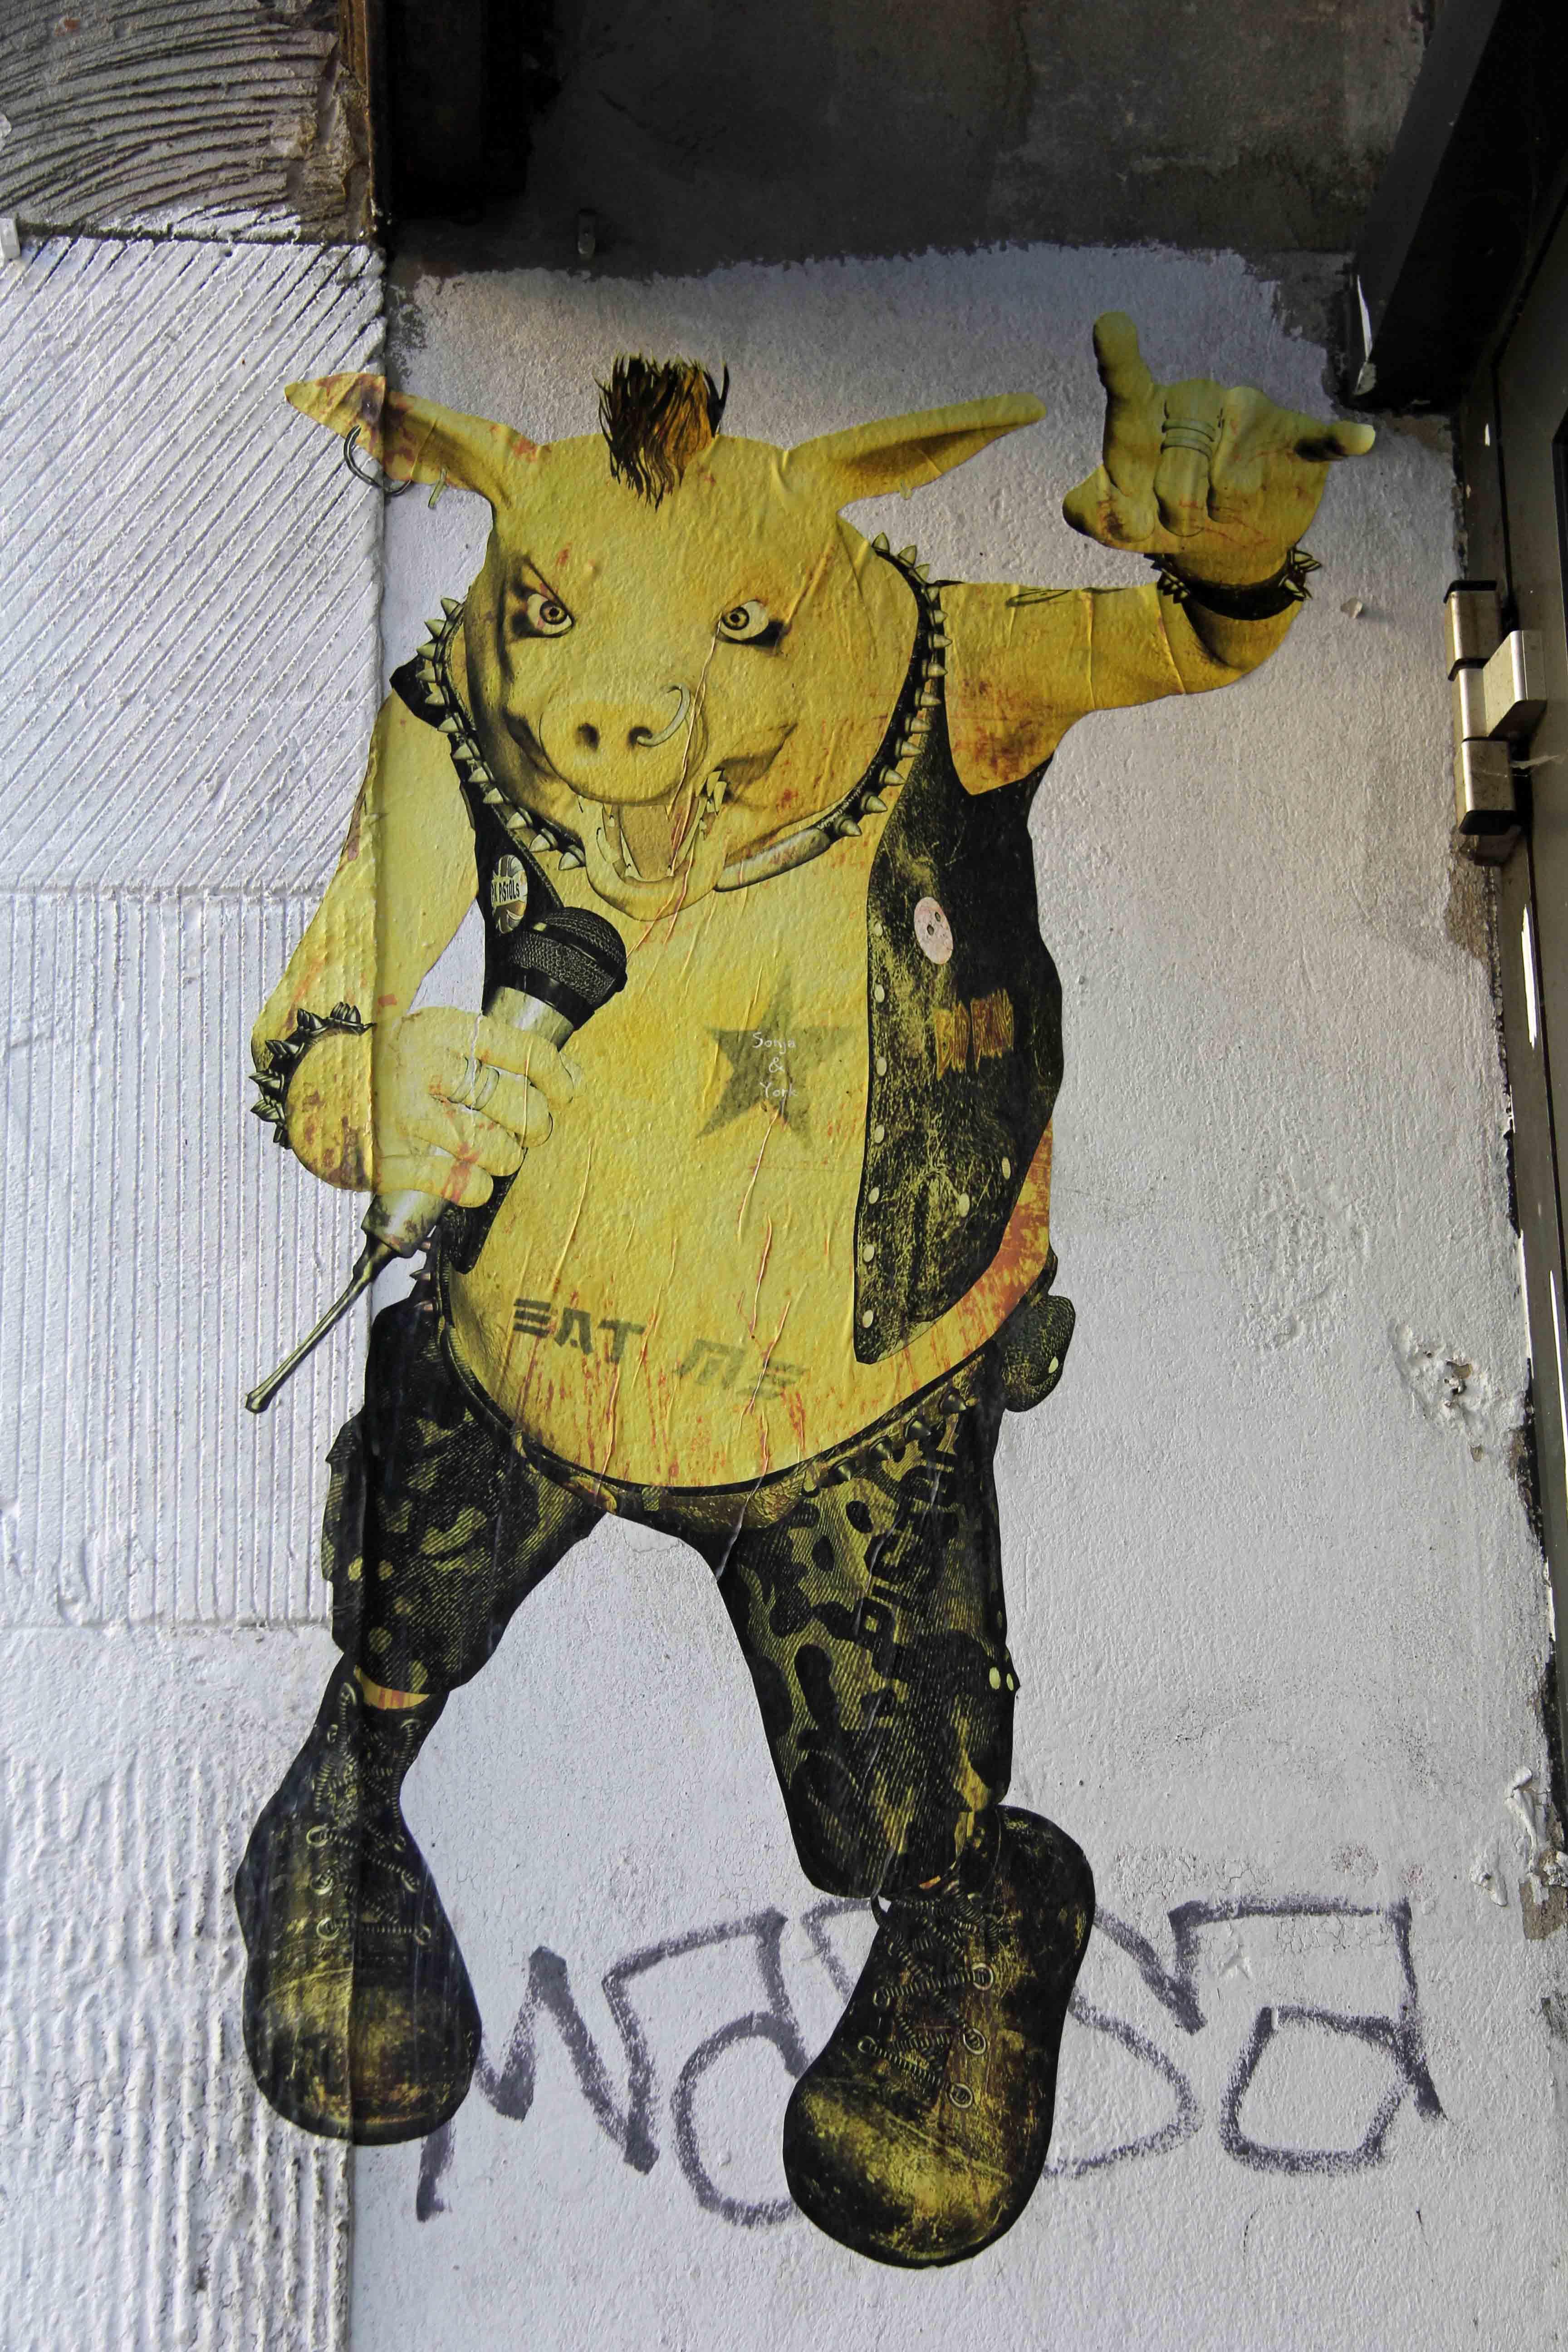 Punk Pig - Street Art by Unknown Artist in Berlin